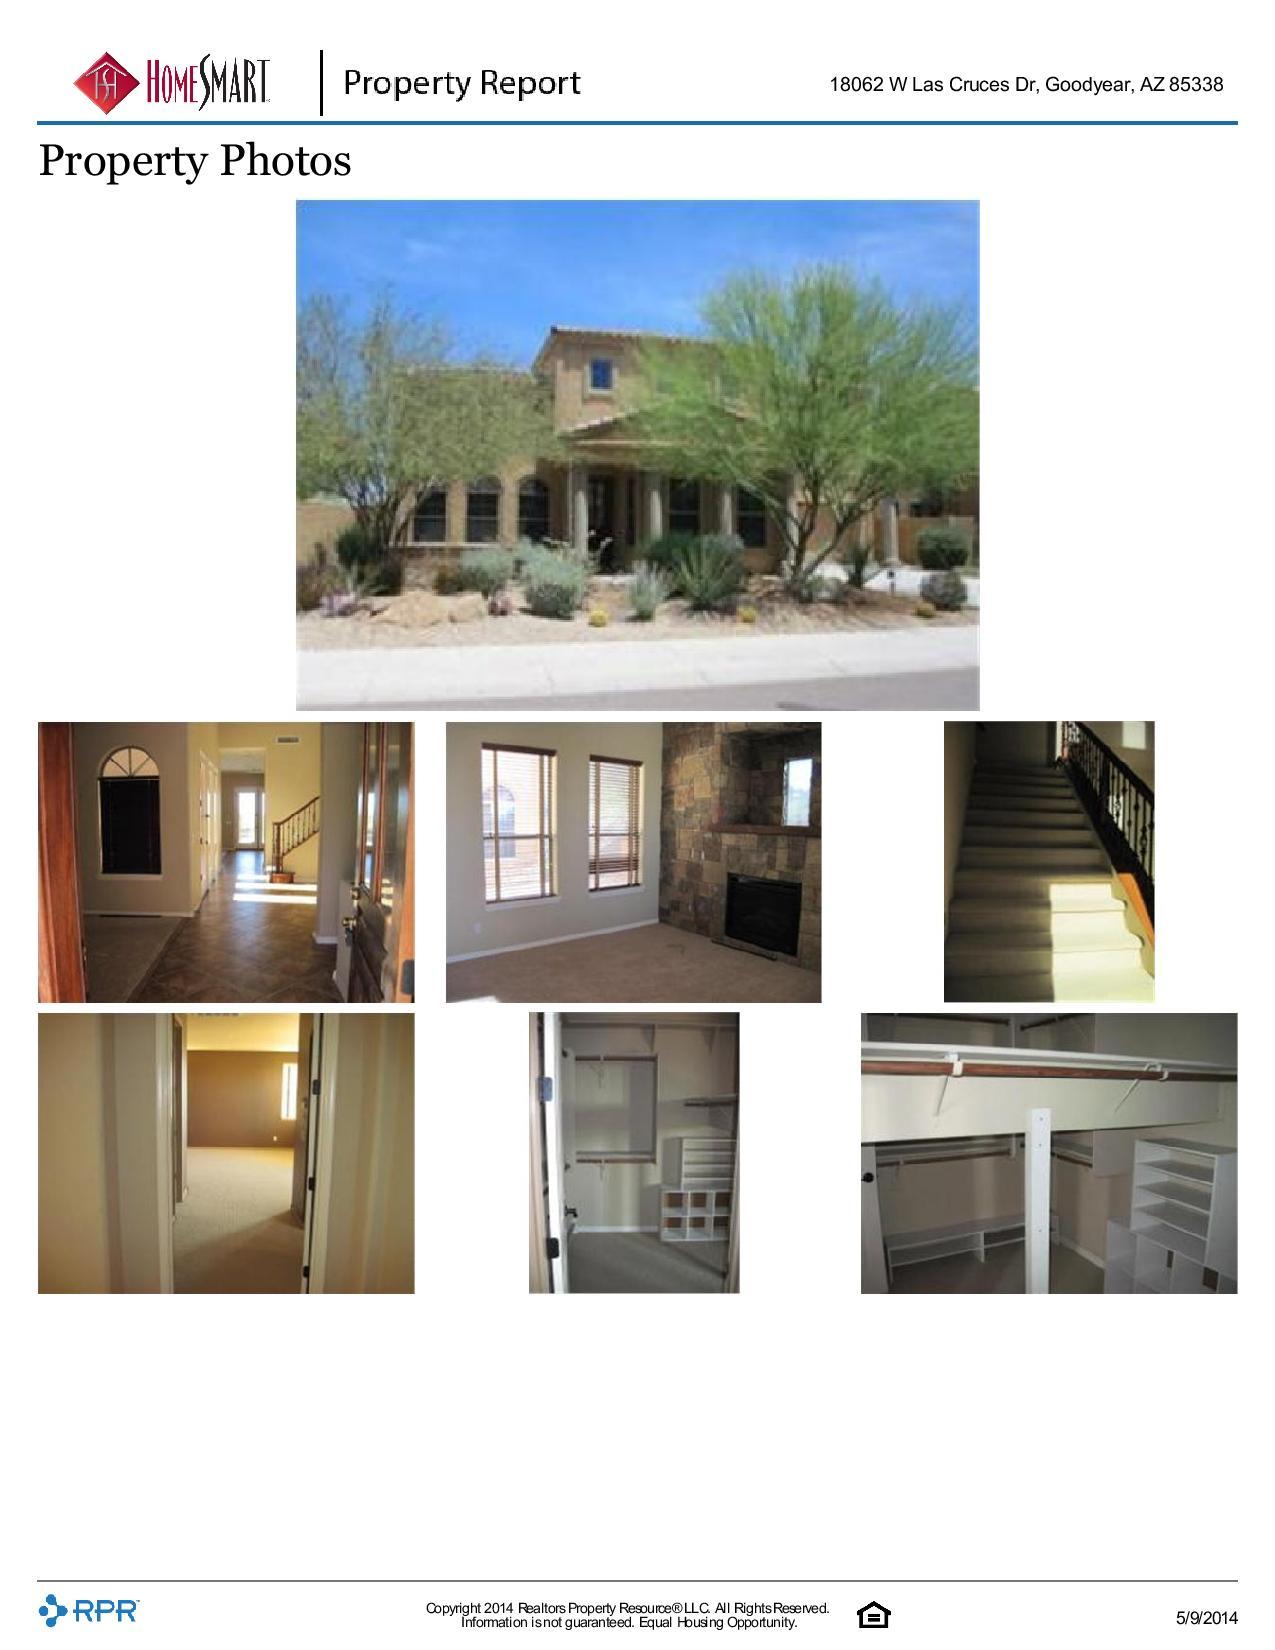 18062-W-Las-Cruces-Dr-Goodyear-AZ-85338-page-004